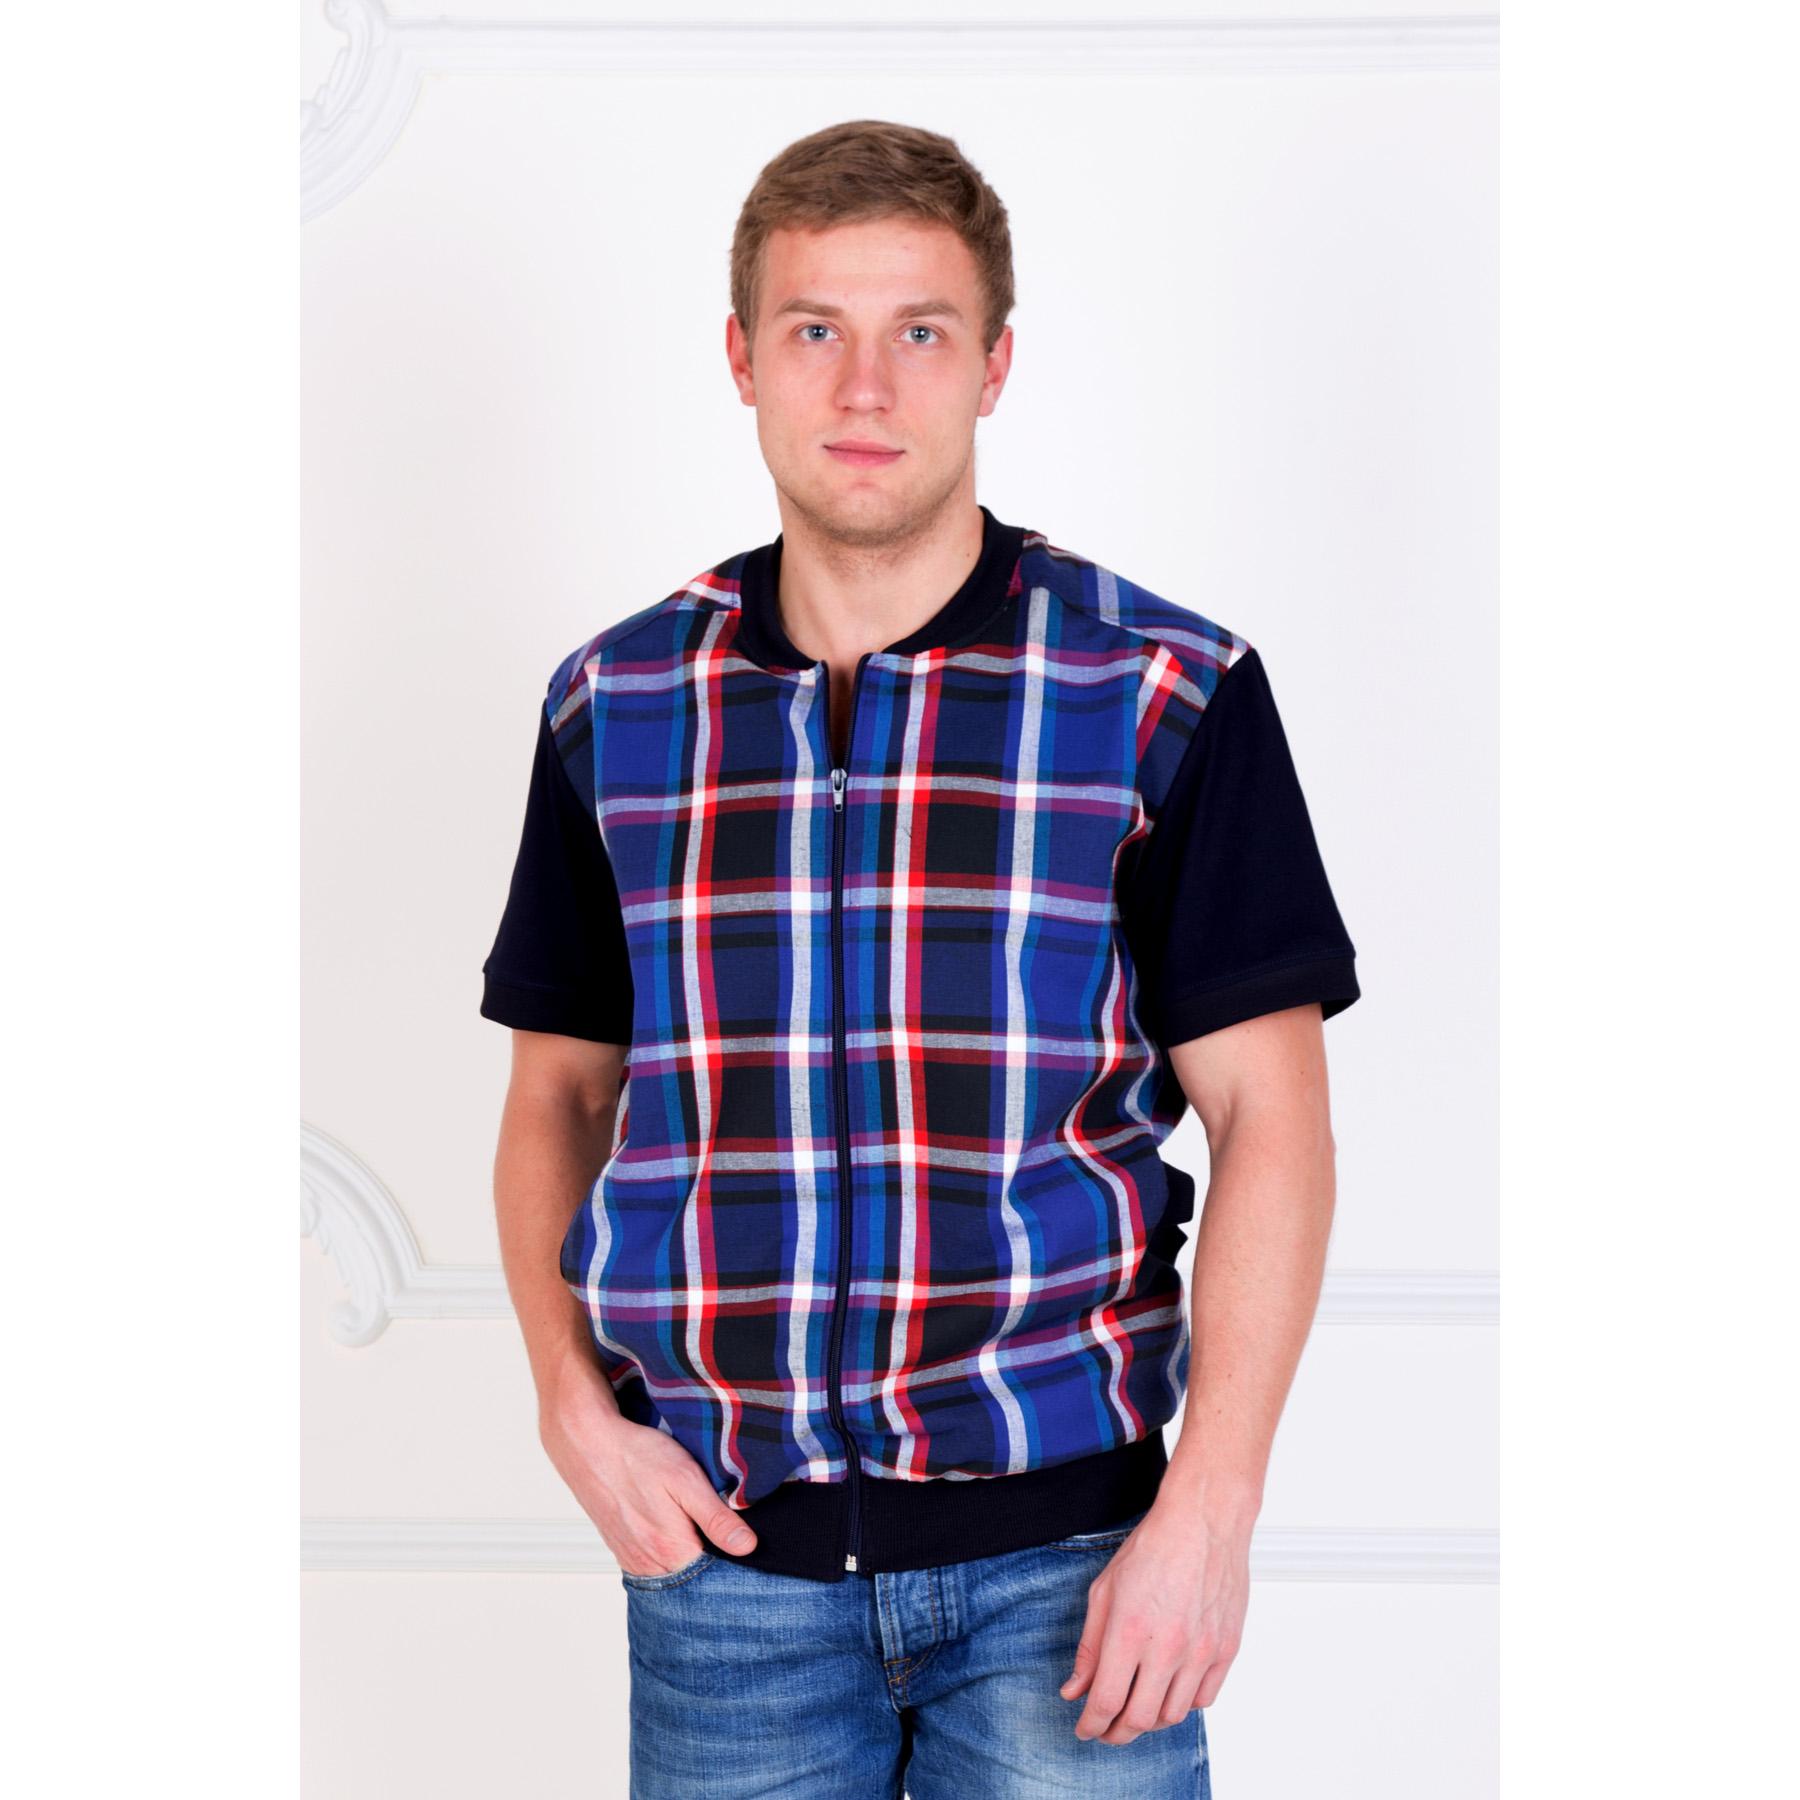 Мужская рубашка «Аполлон» , размер 42Рубашки<br>Обхват груди: 84 см <br>Обхват талии: 84 см <br>Обхват бедер: 88 см <br>Рост: 170-176 см<br><br>Тип: Муж. рубашка<br>Размер: 42<br>Материал: Шотландка